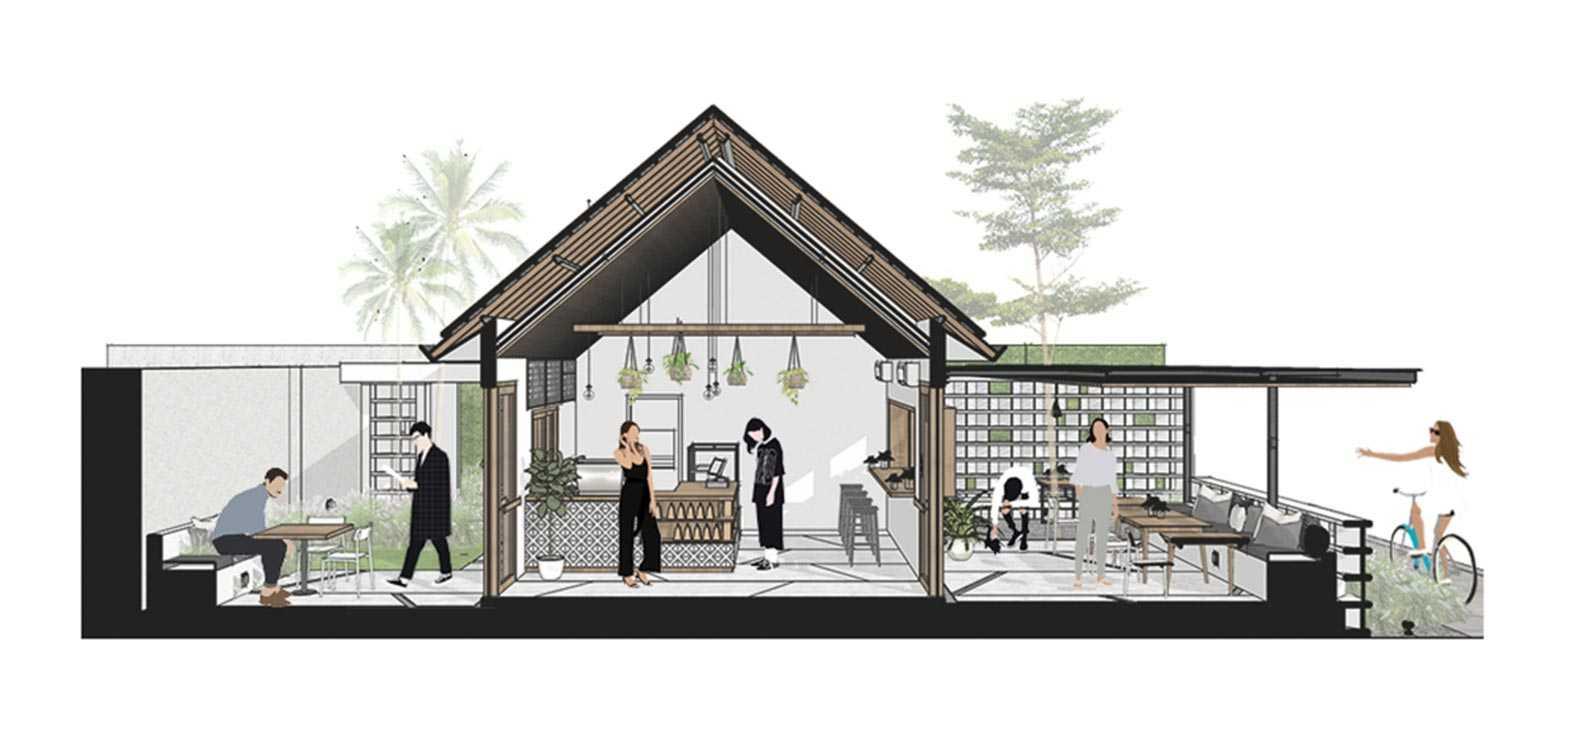 Bentuk bangunan kafe memanjang (Sumber: archdaily.com)